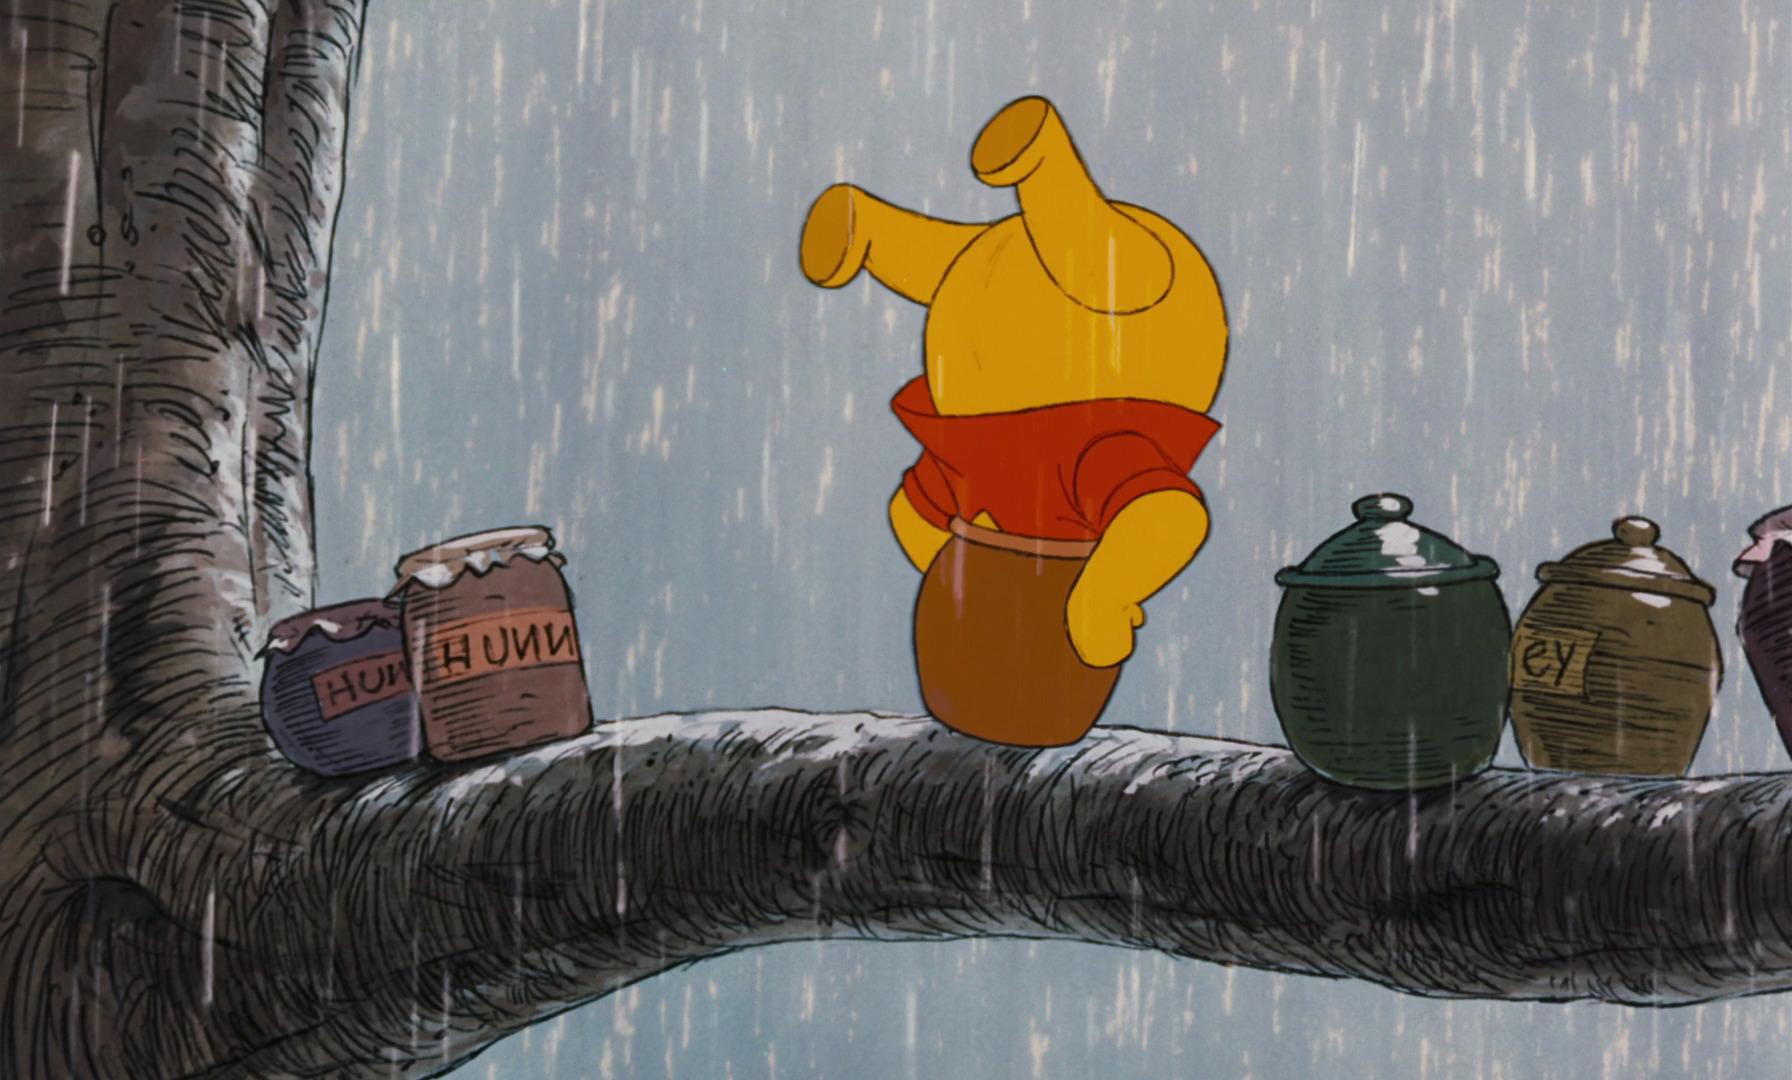 image winnie the pooh has his head stuck in his honey pot jpg